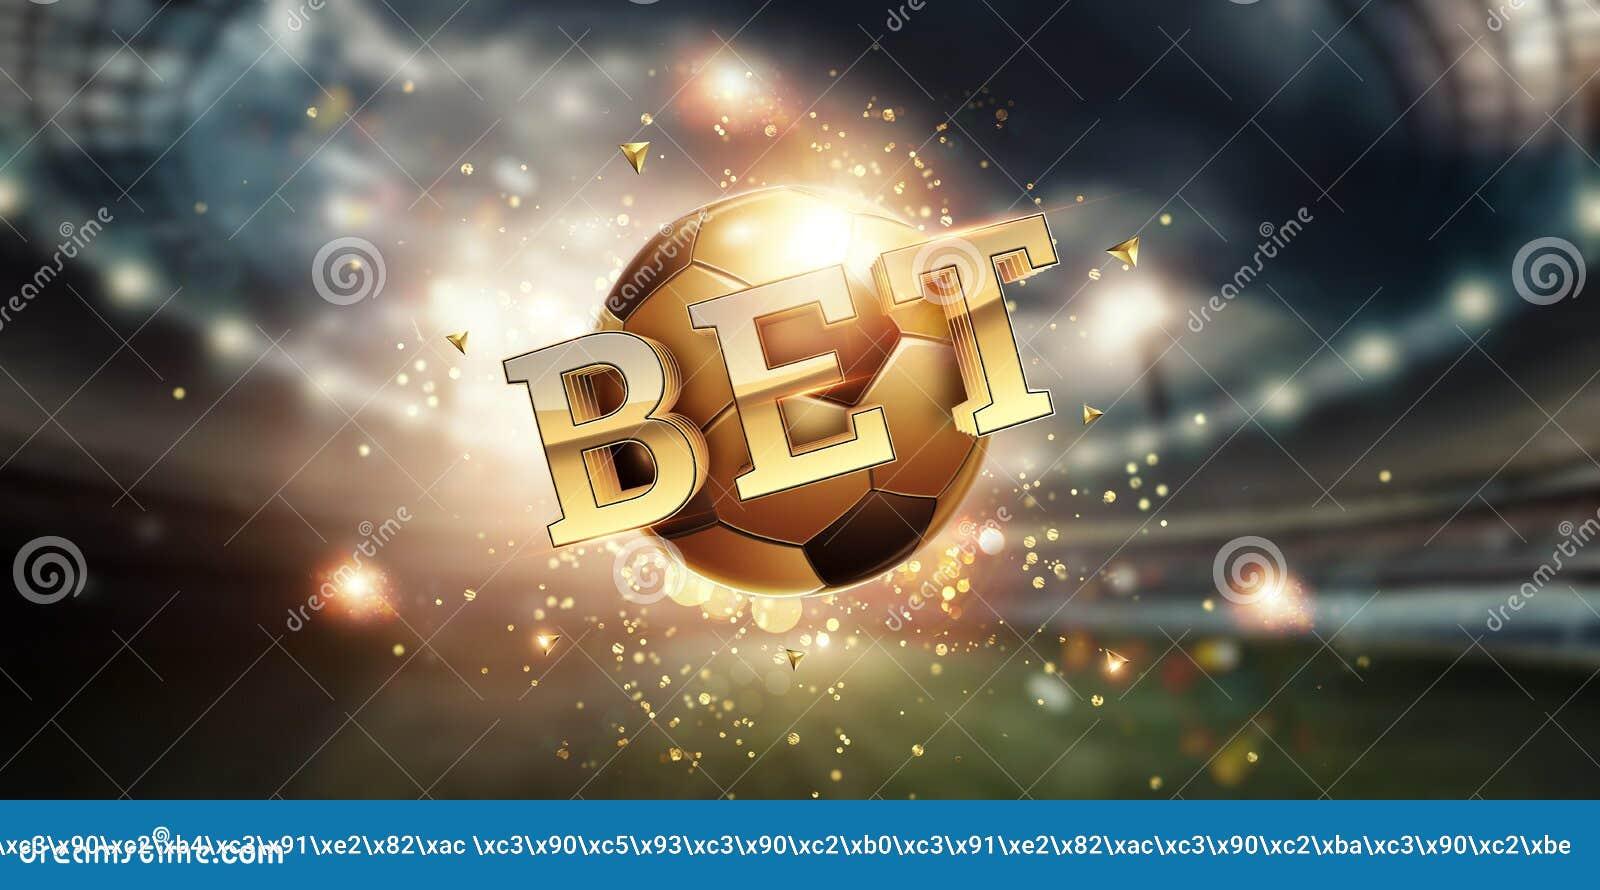 Goldenbetting glitz csgo betting